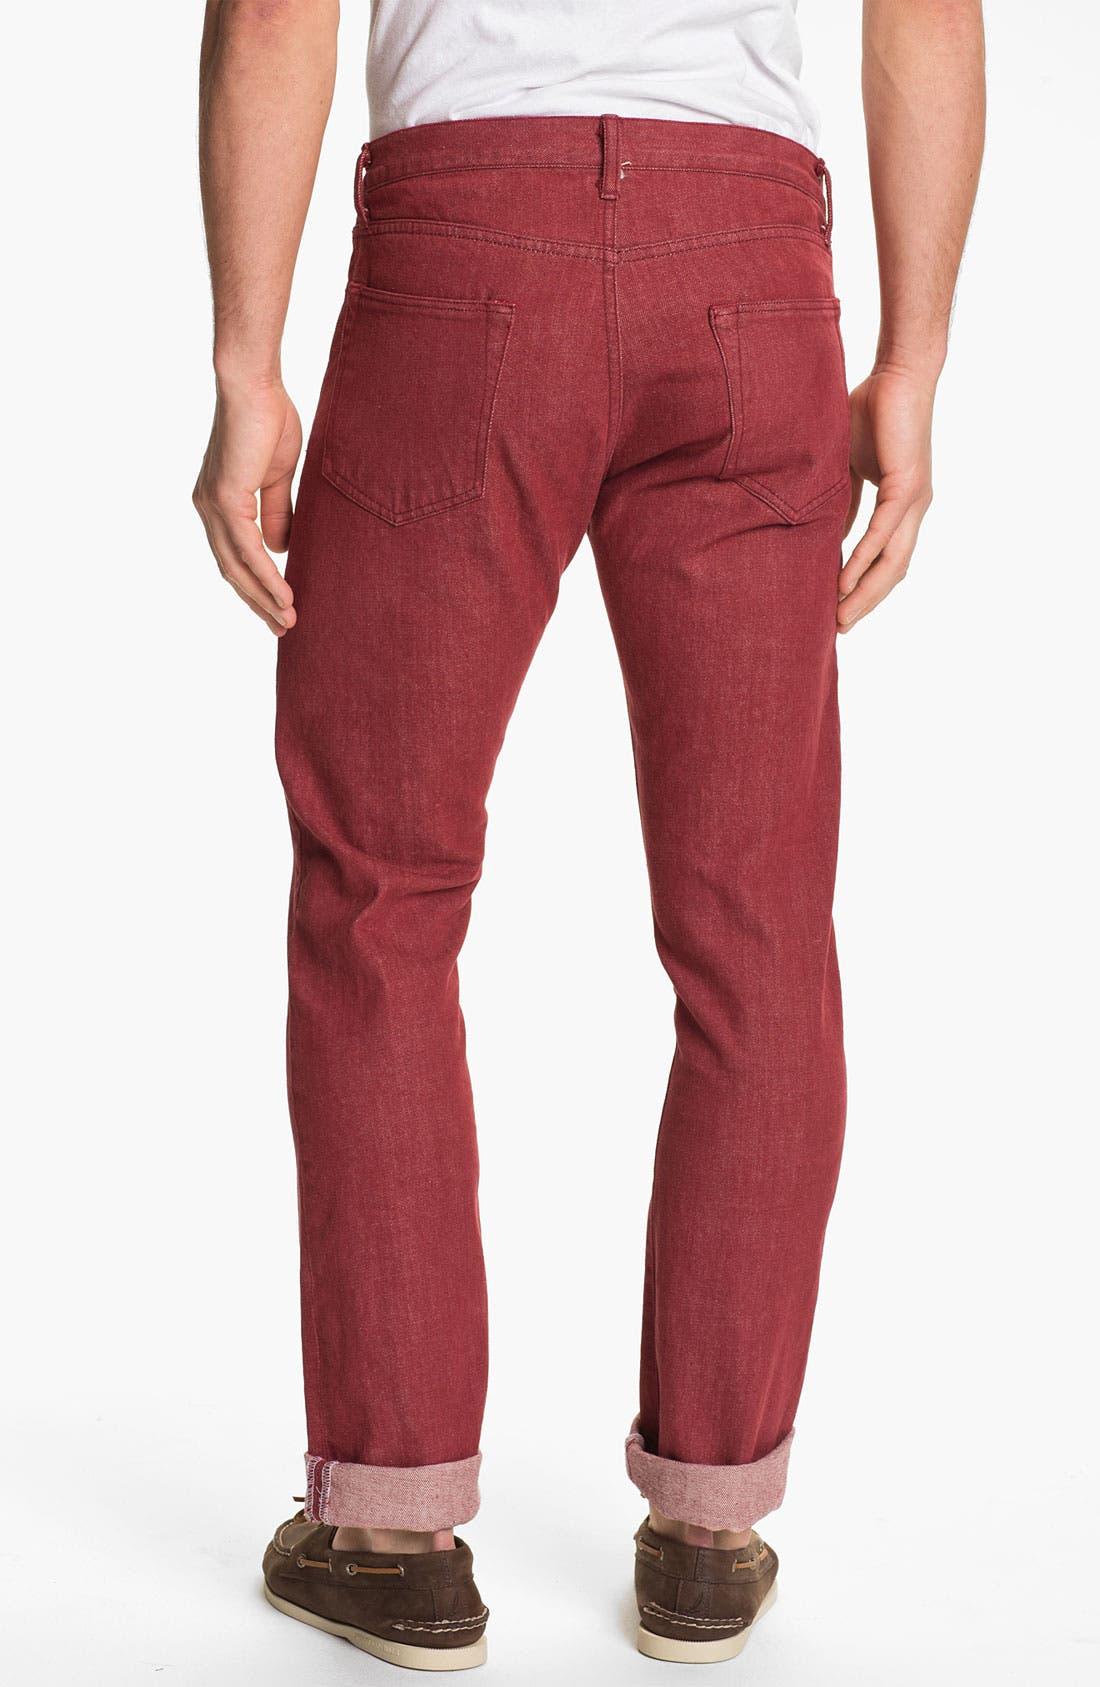 Alternate Image 1 Selected - J. Press York Street 'Hanover' Slim Fit Selvedge Jeans